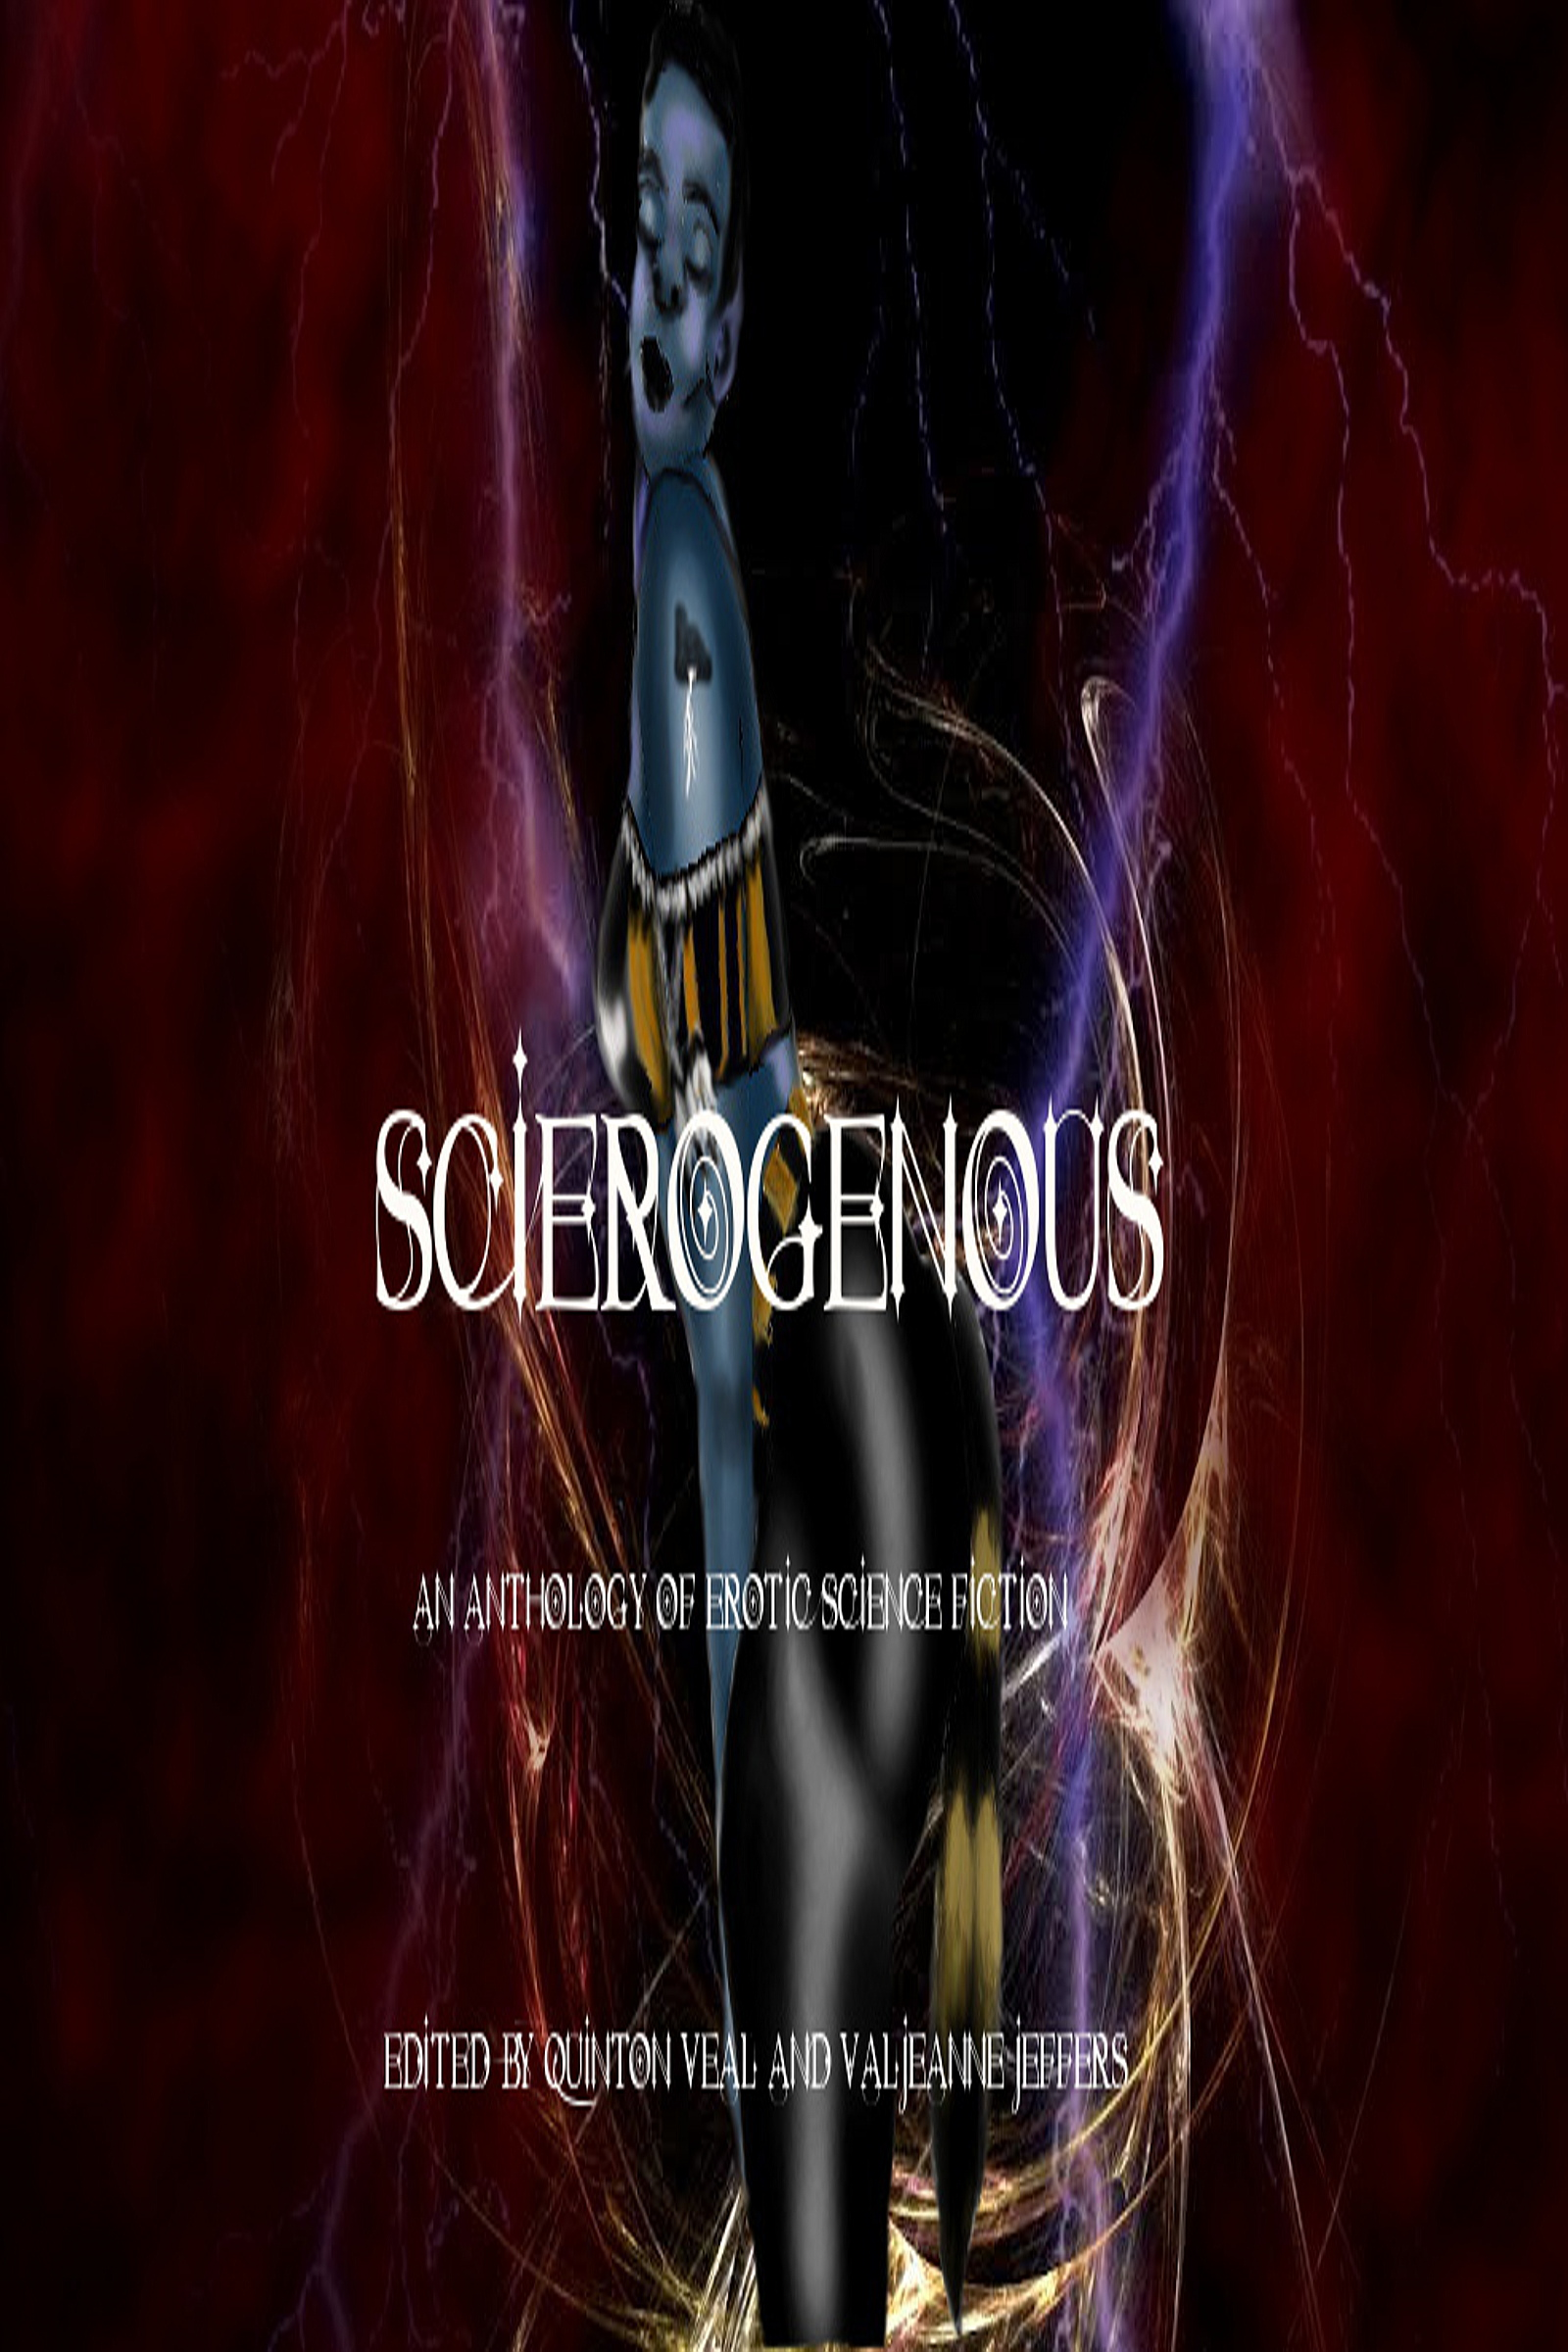 Erotic science fiction hentia photo